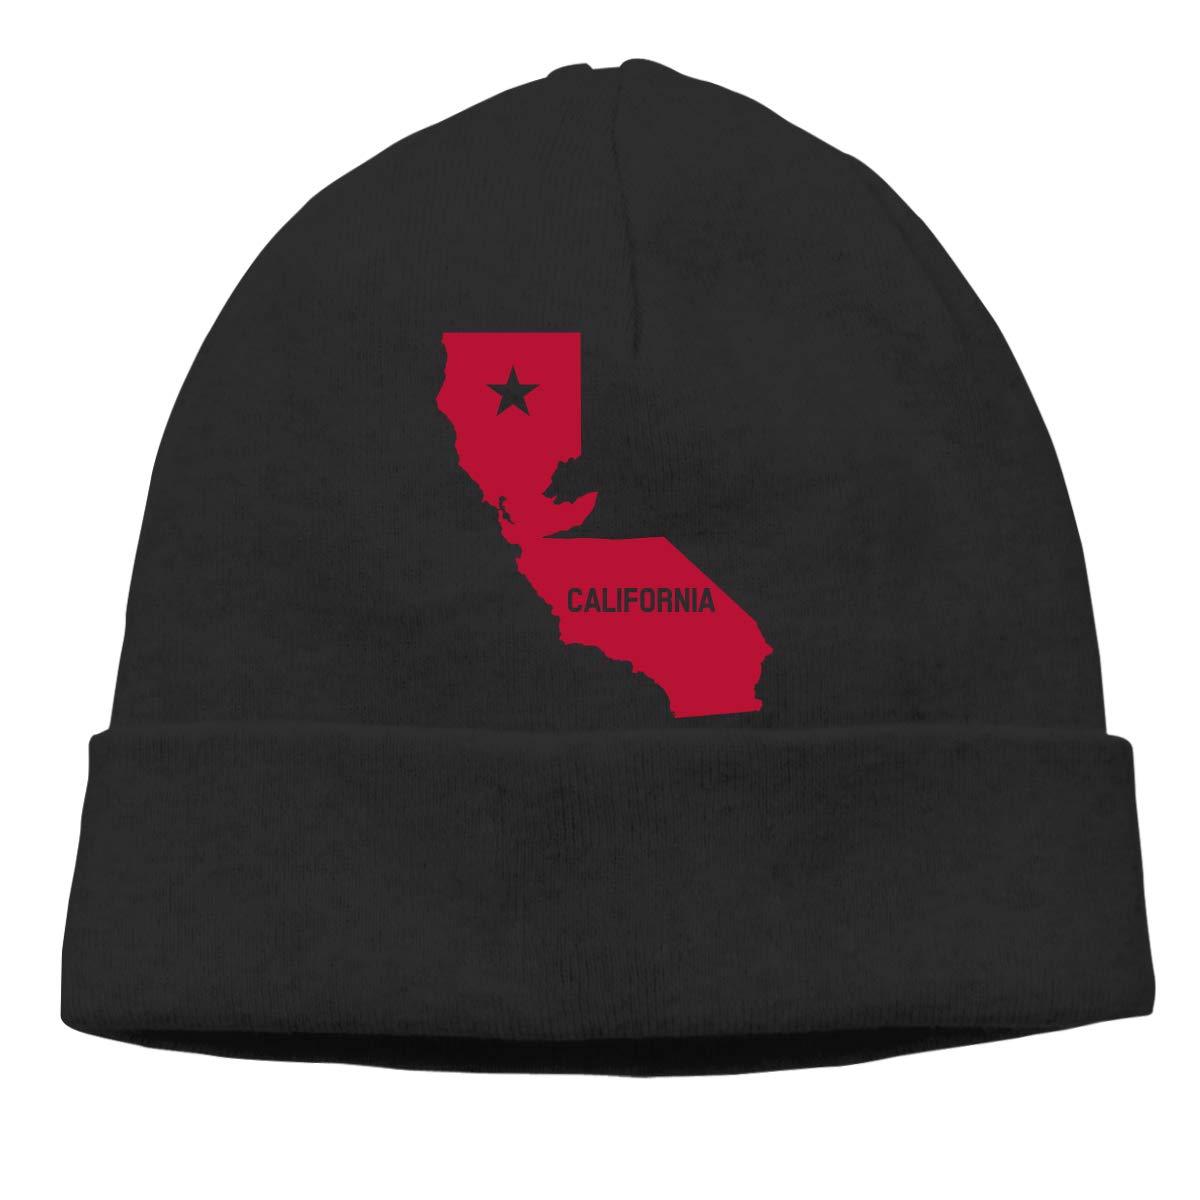 Beanie Hat California Fag Map Warm Skull Caps for Men and Women